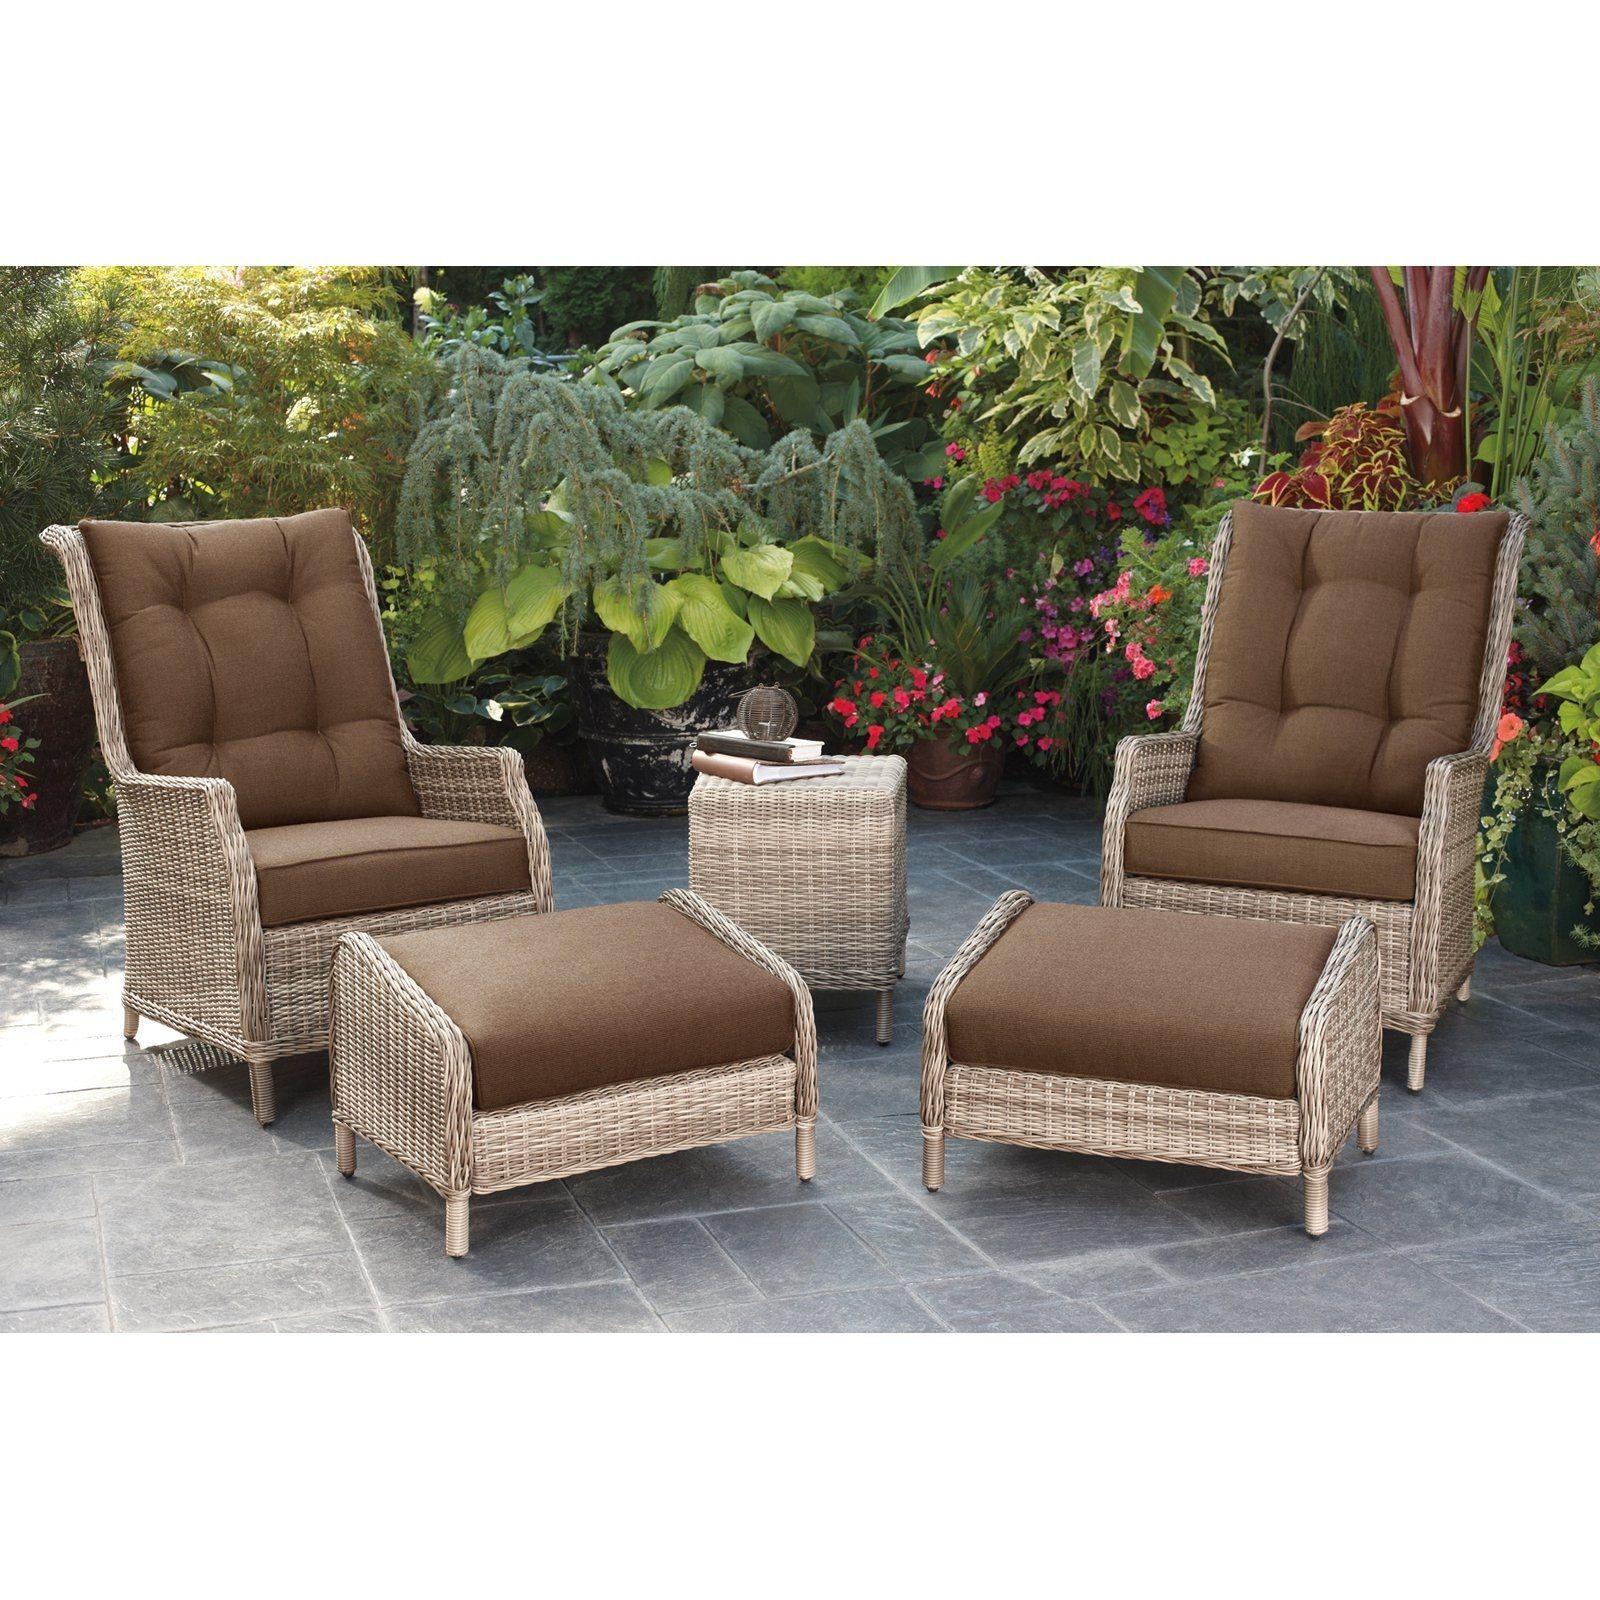 Patio Furniture Clearance Miami Clearancefurniture